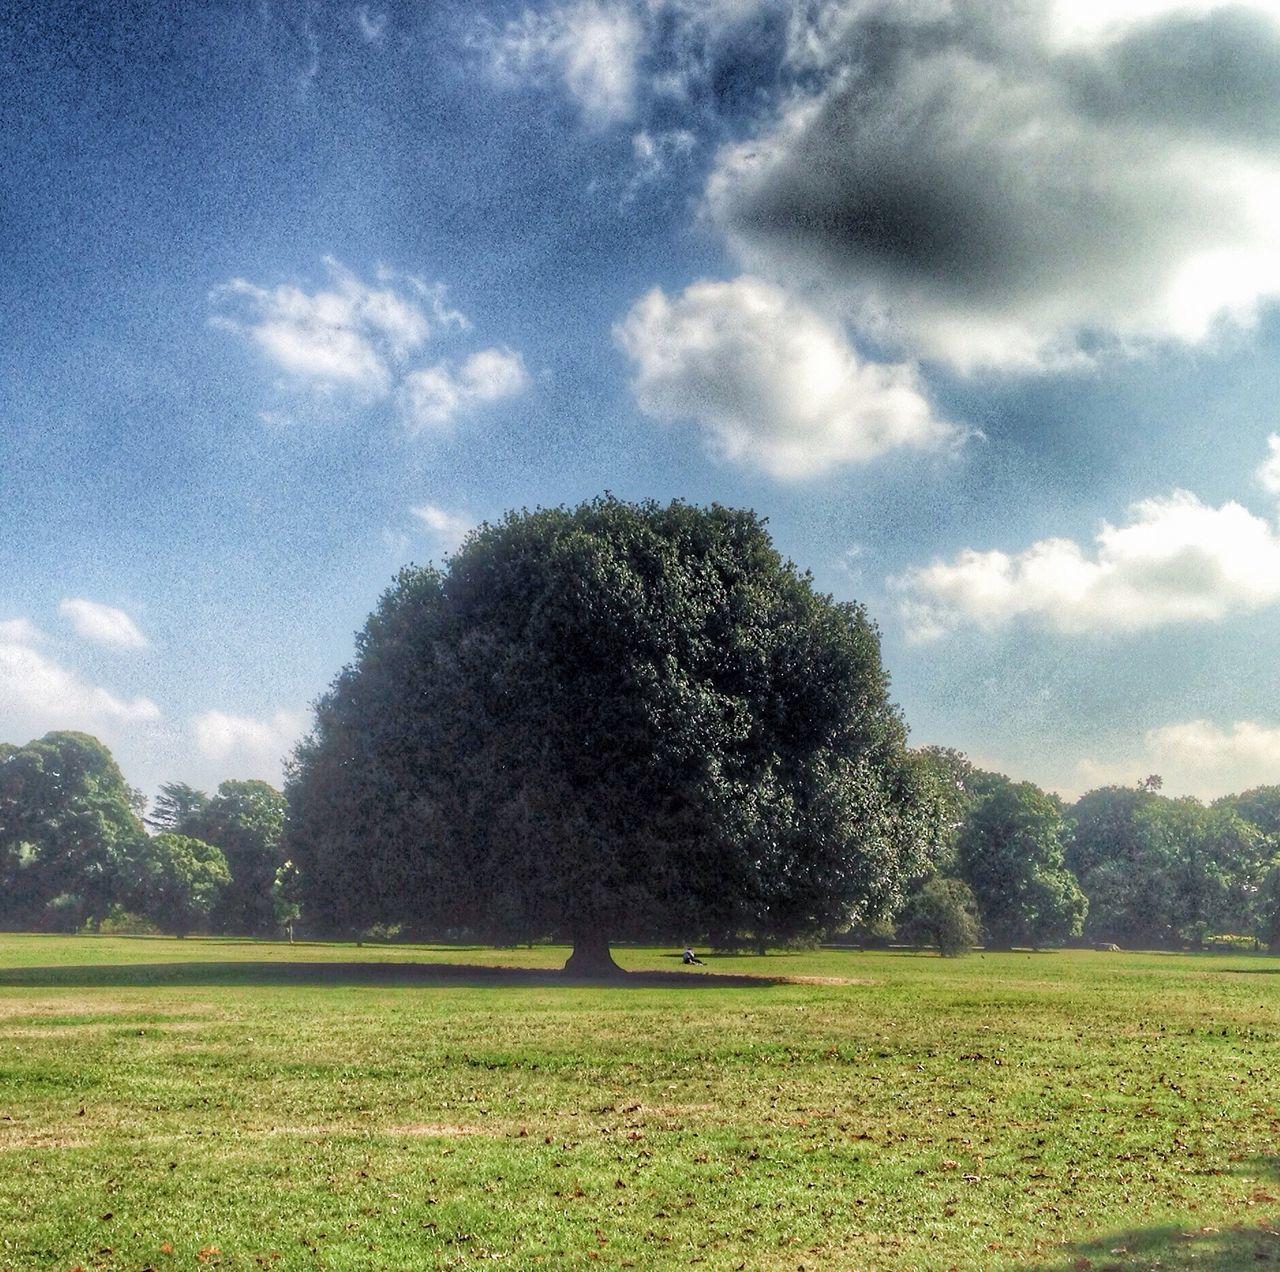 Tree Tranquil Scene Grass Growth Green Color Scenics Landscape Beauty In Nature Non-urban Scene Day London Greenwich Park